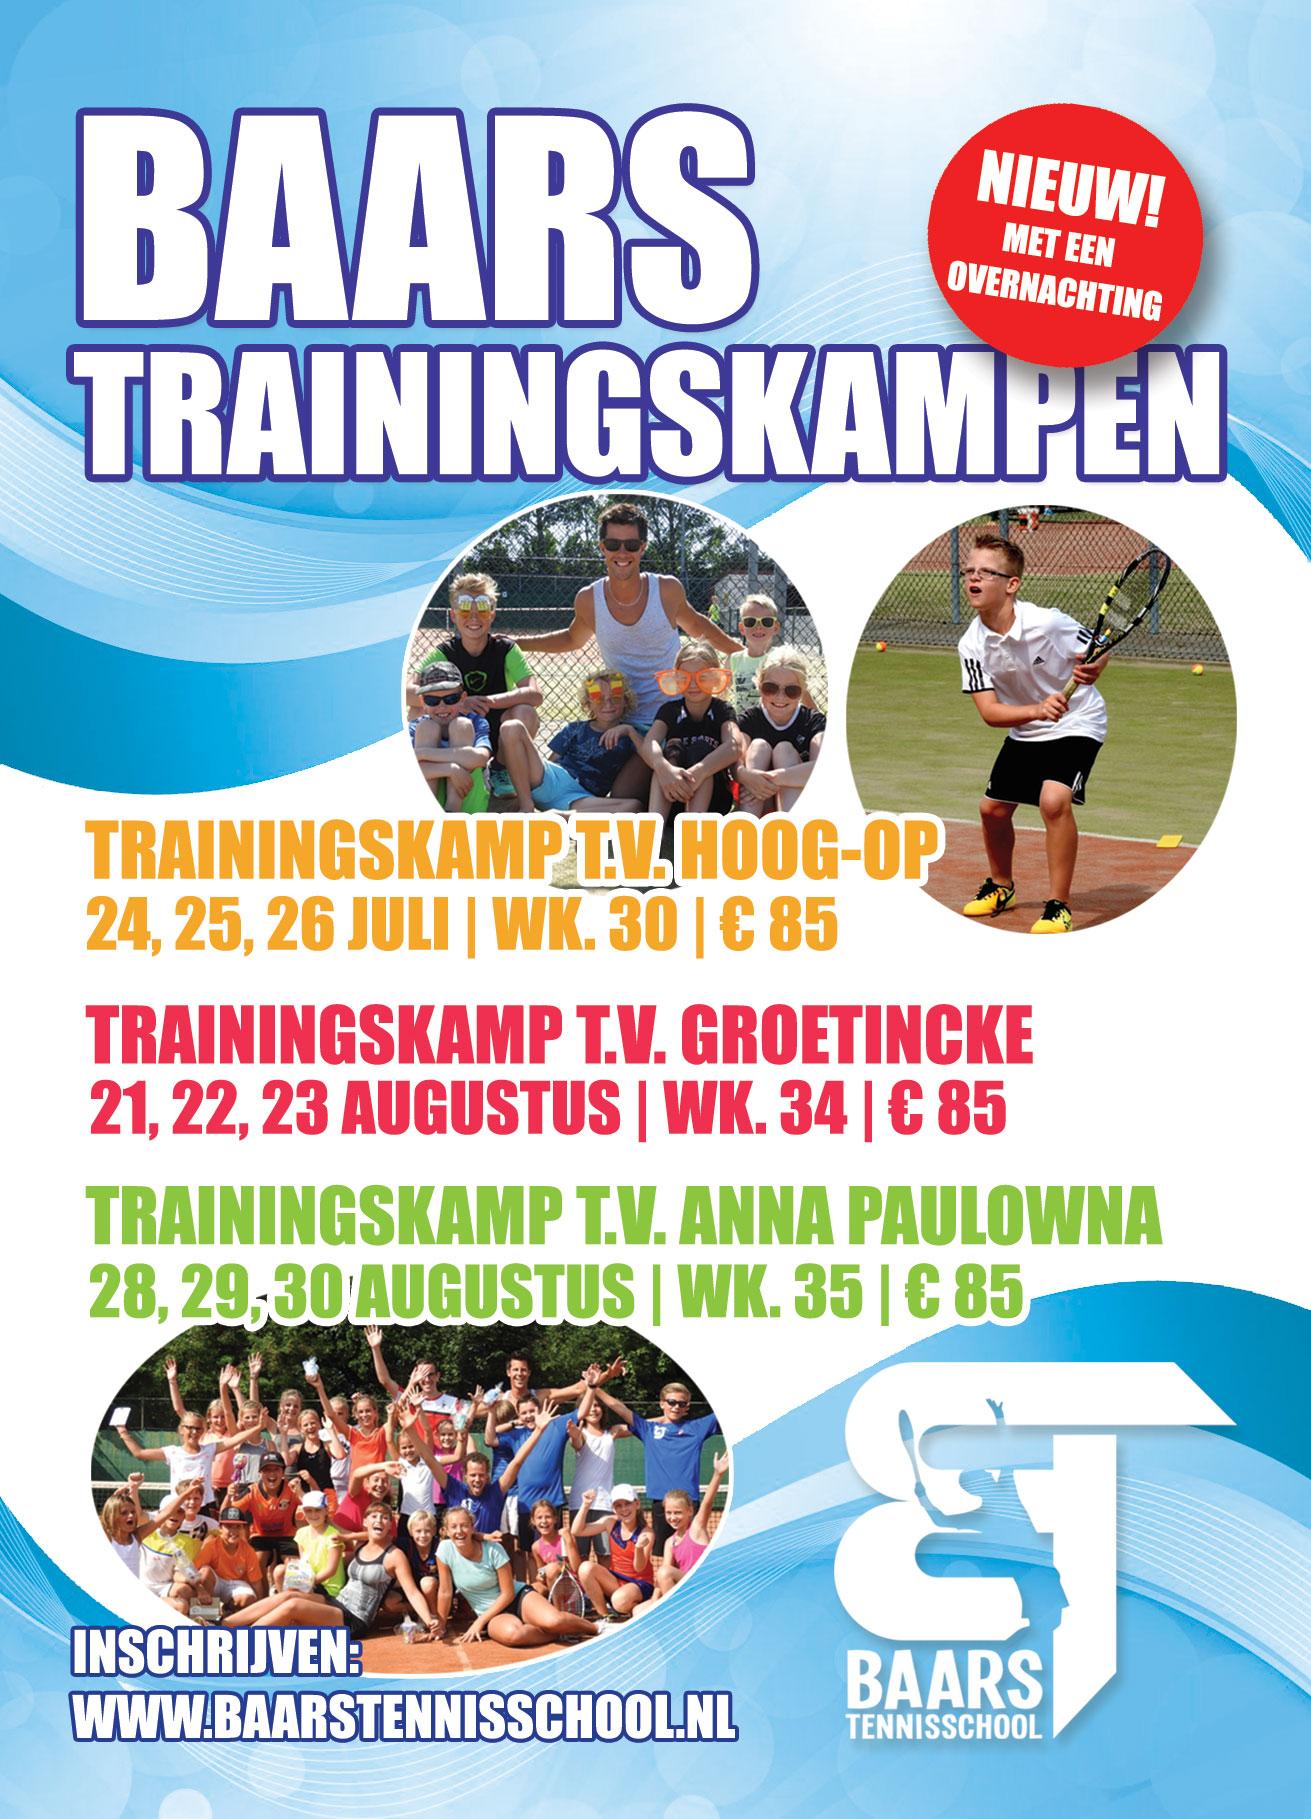 Baars Trainingskampen flyer 2017